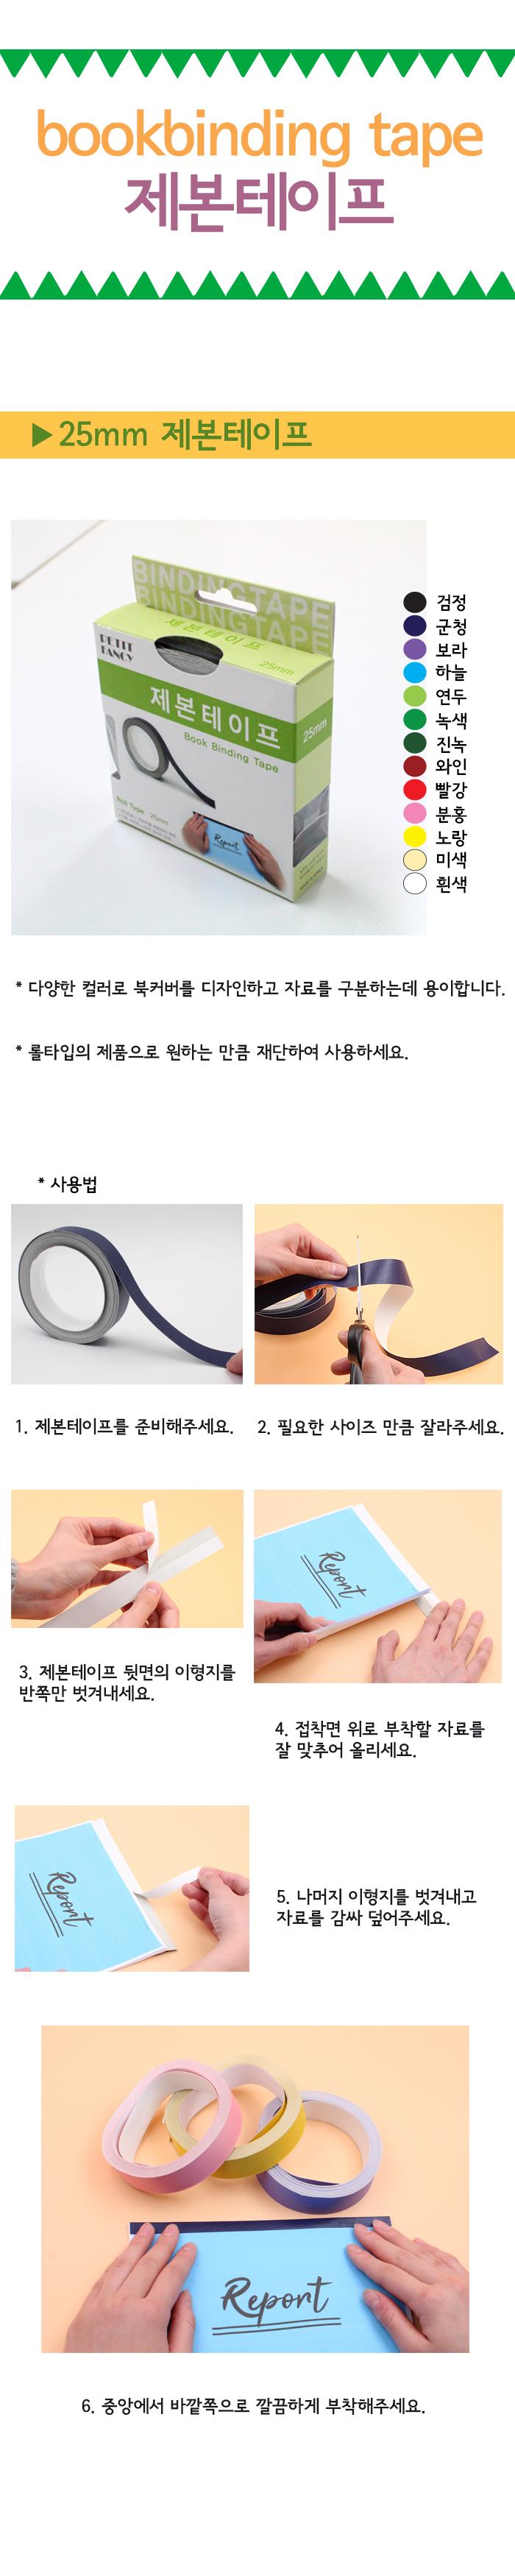 bookbinding_tape_25.jpg